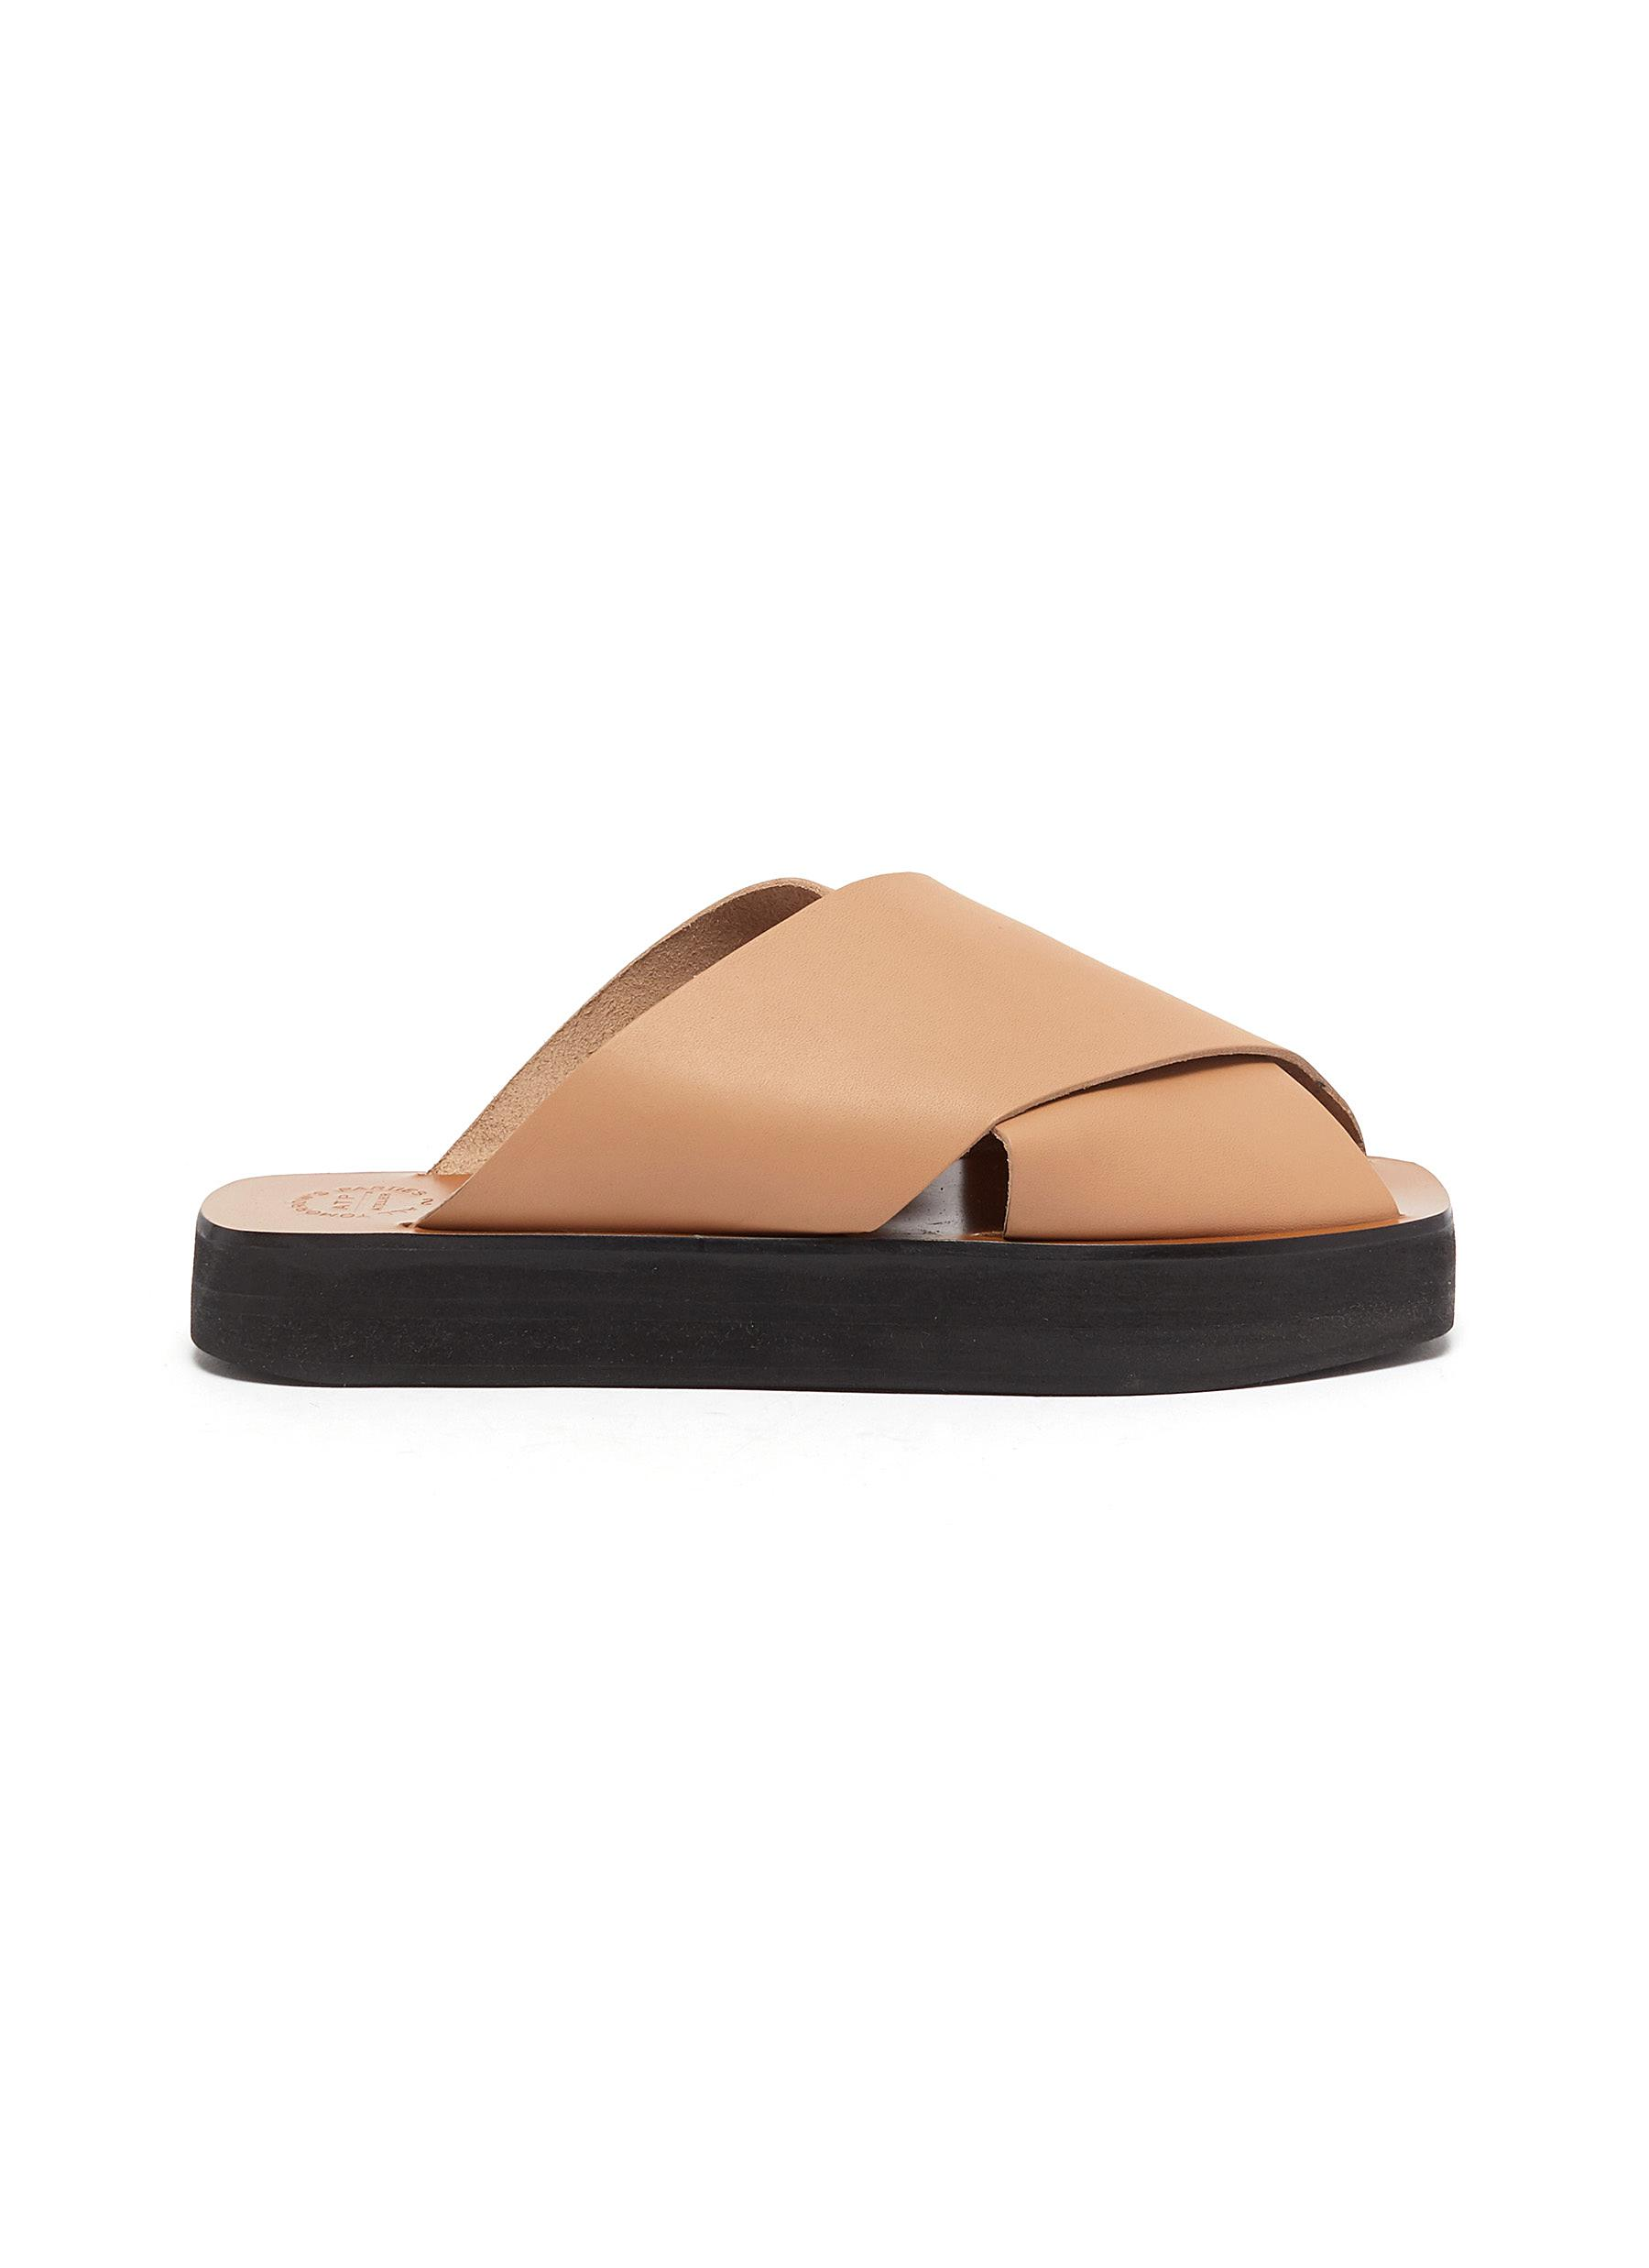 Atp Atelier 'Acai' Cross Band Leather Slide Sandals